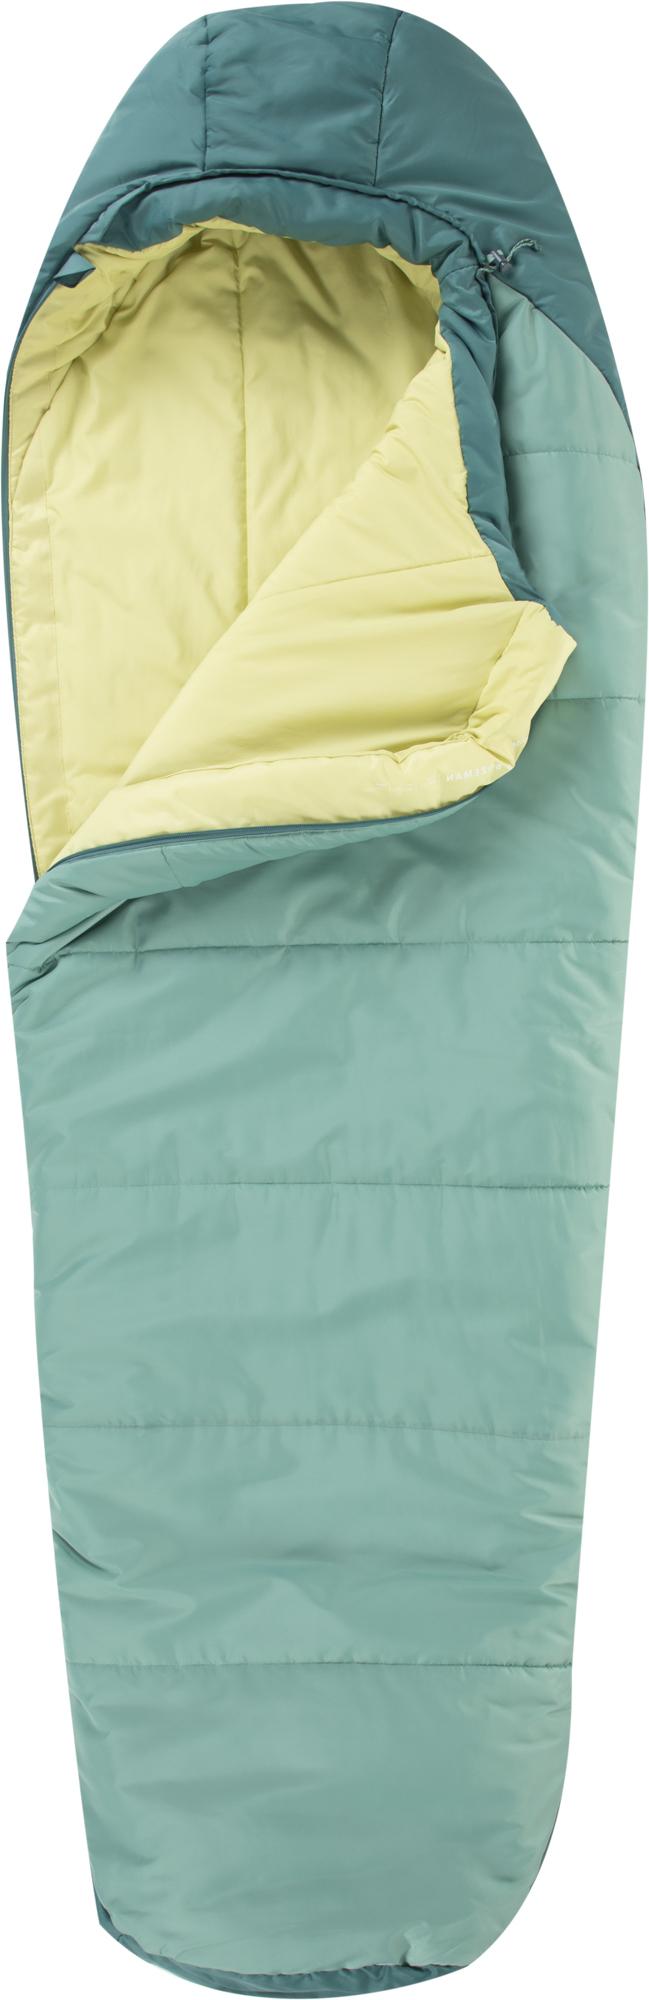 цены Mountain Hardwear Спальный мешок Mountain Hardwear -3 правосторонний